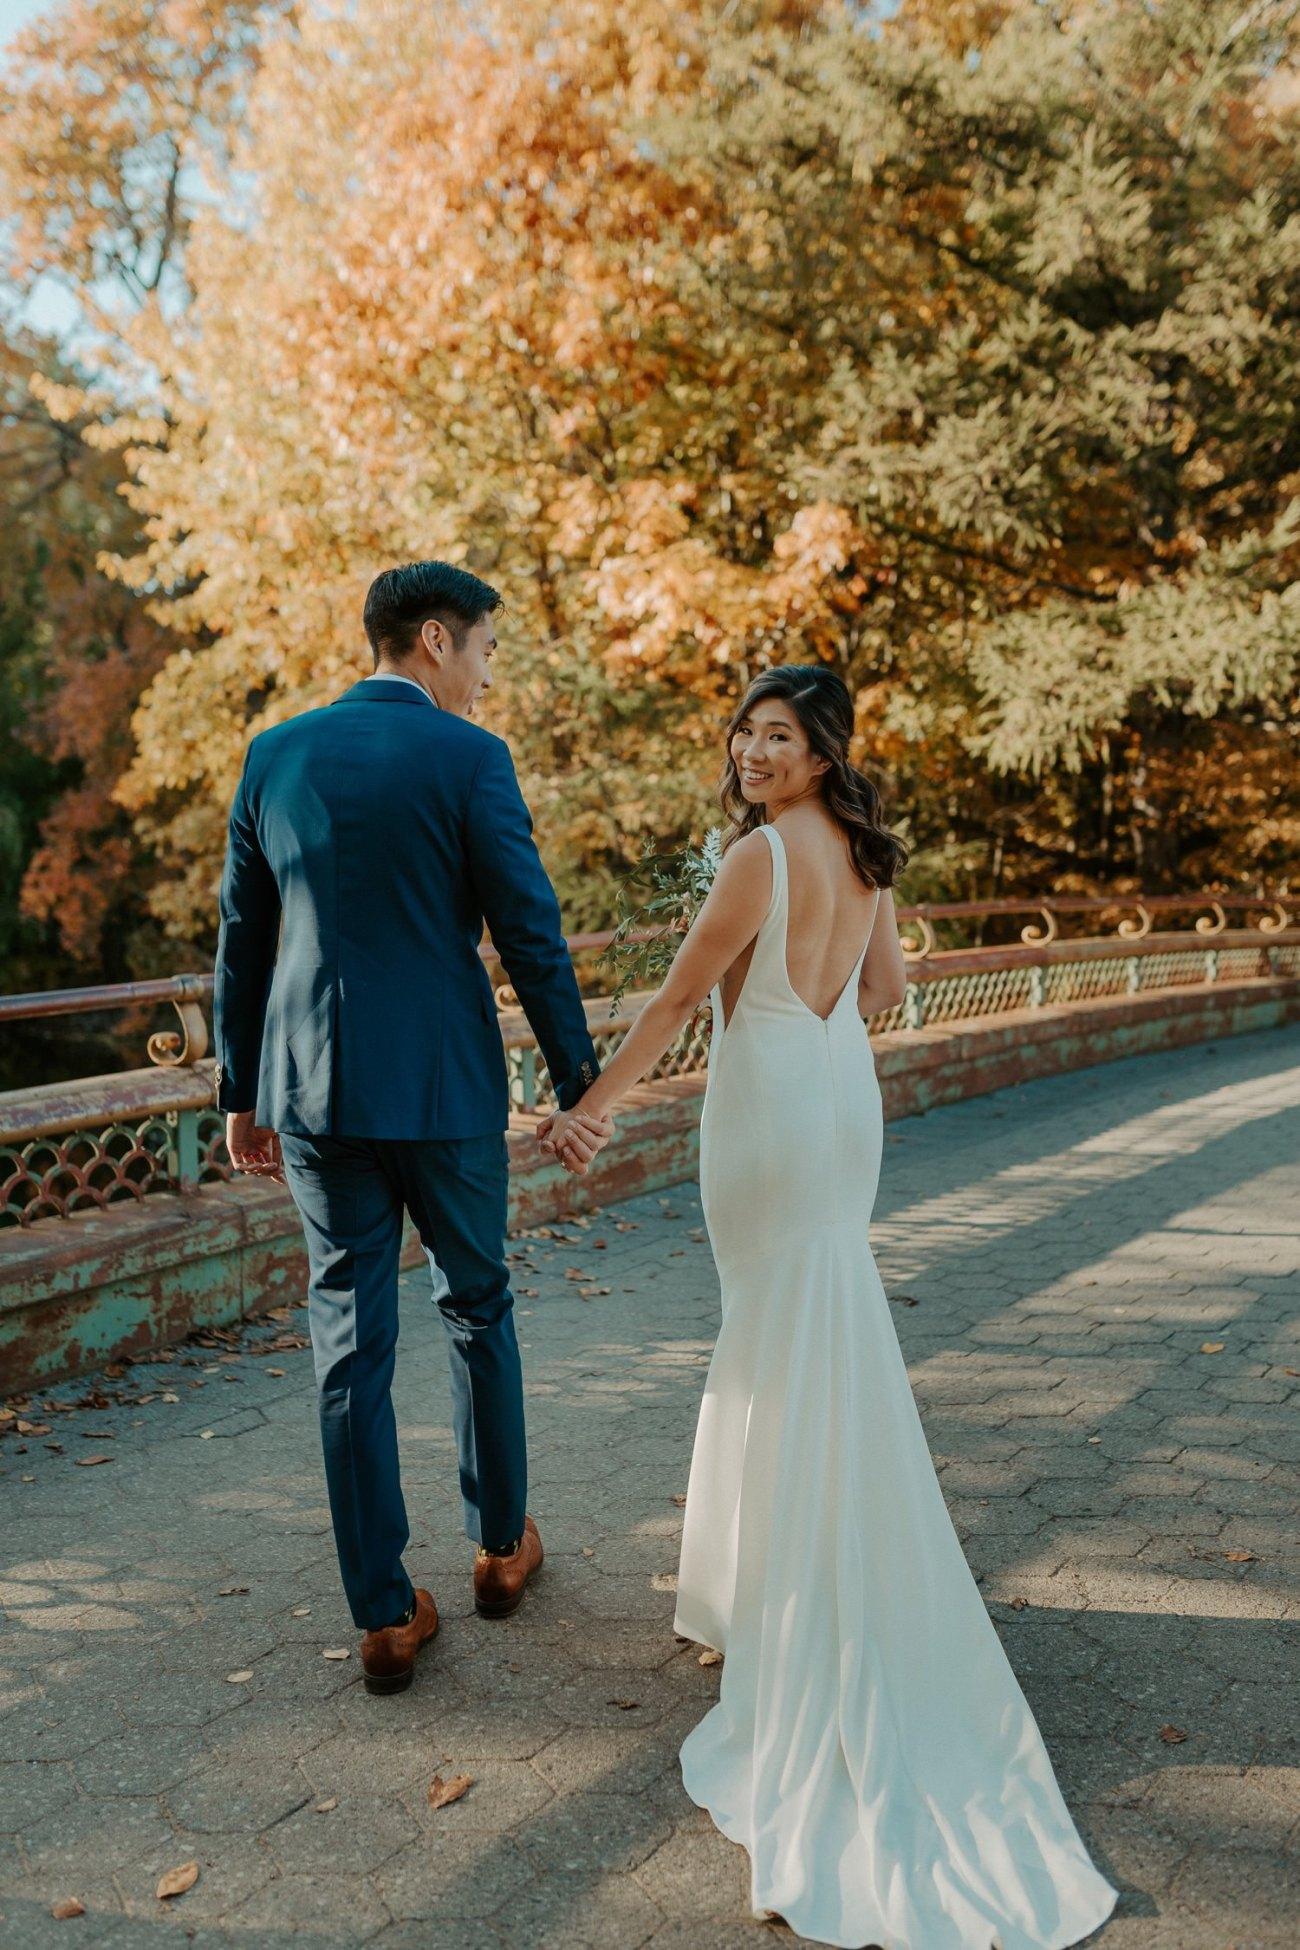 Prospect Park Brooklyn Wedding Fall Wedding In NYC New York Wedding Photographer Anais Possamai Photography 06